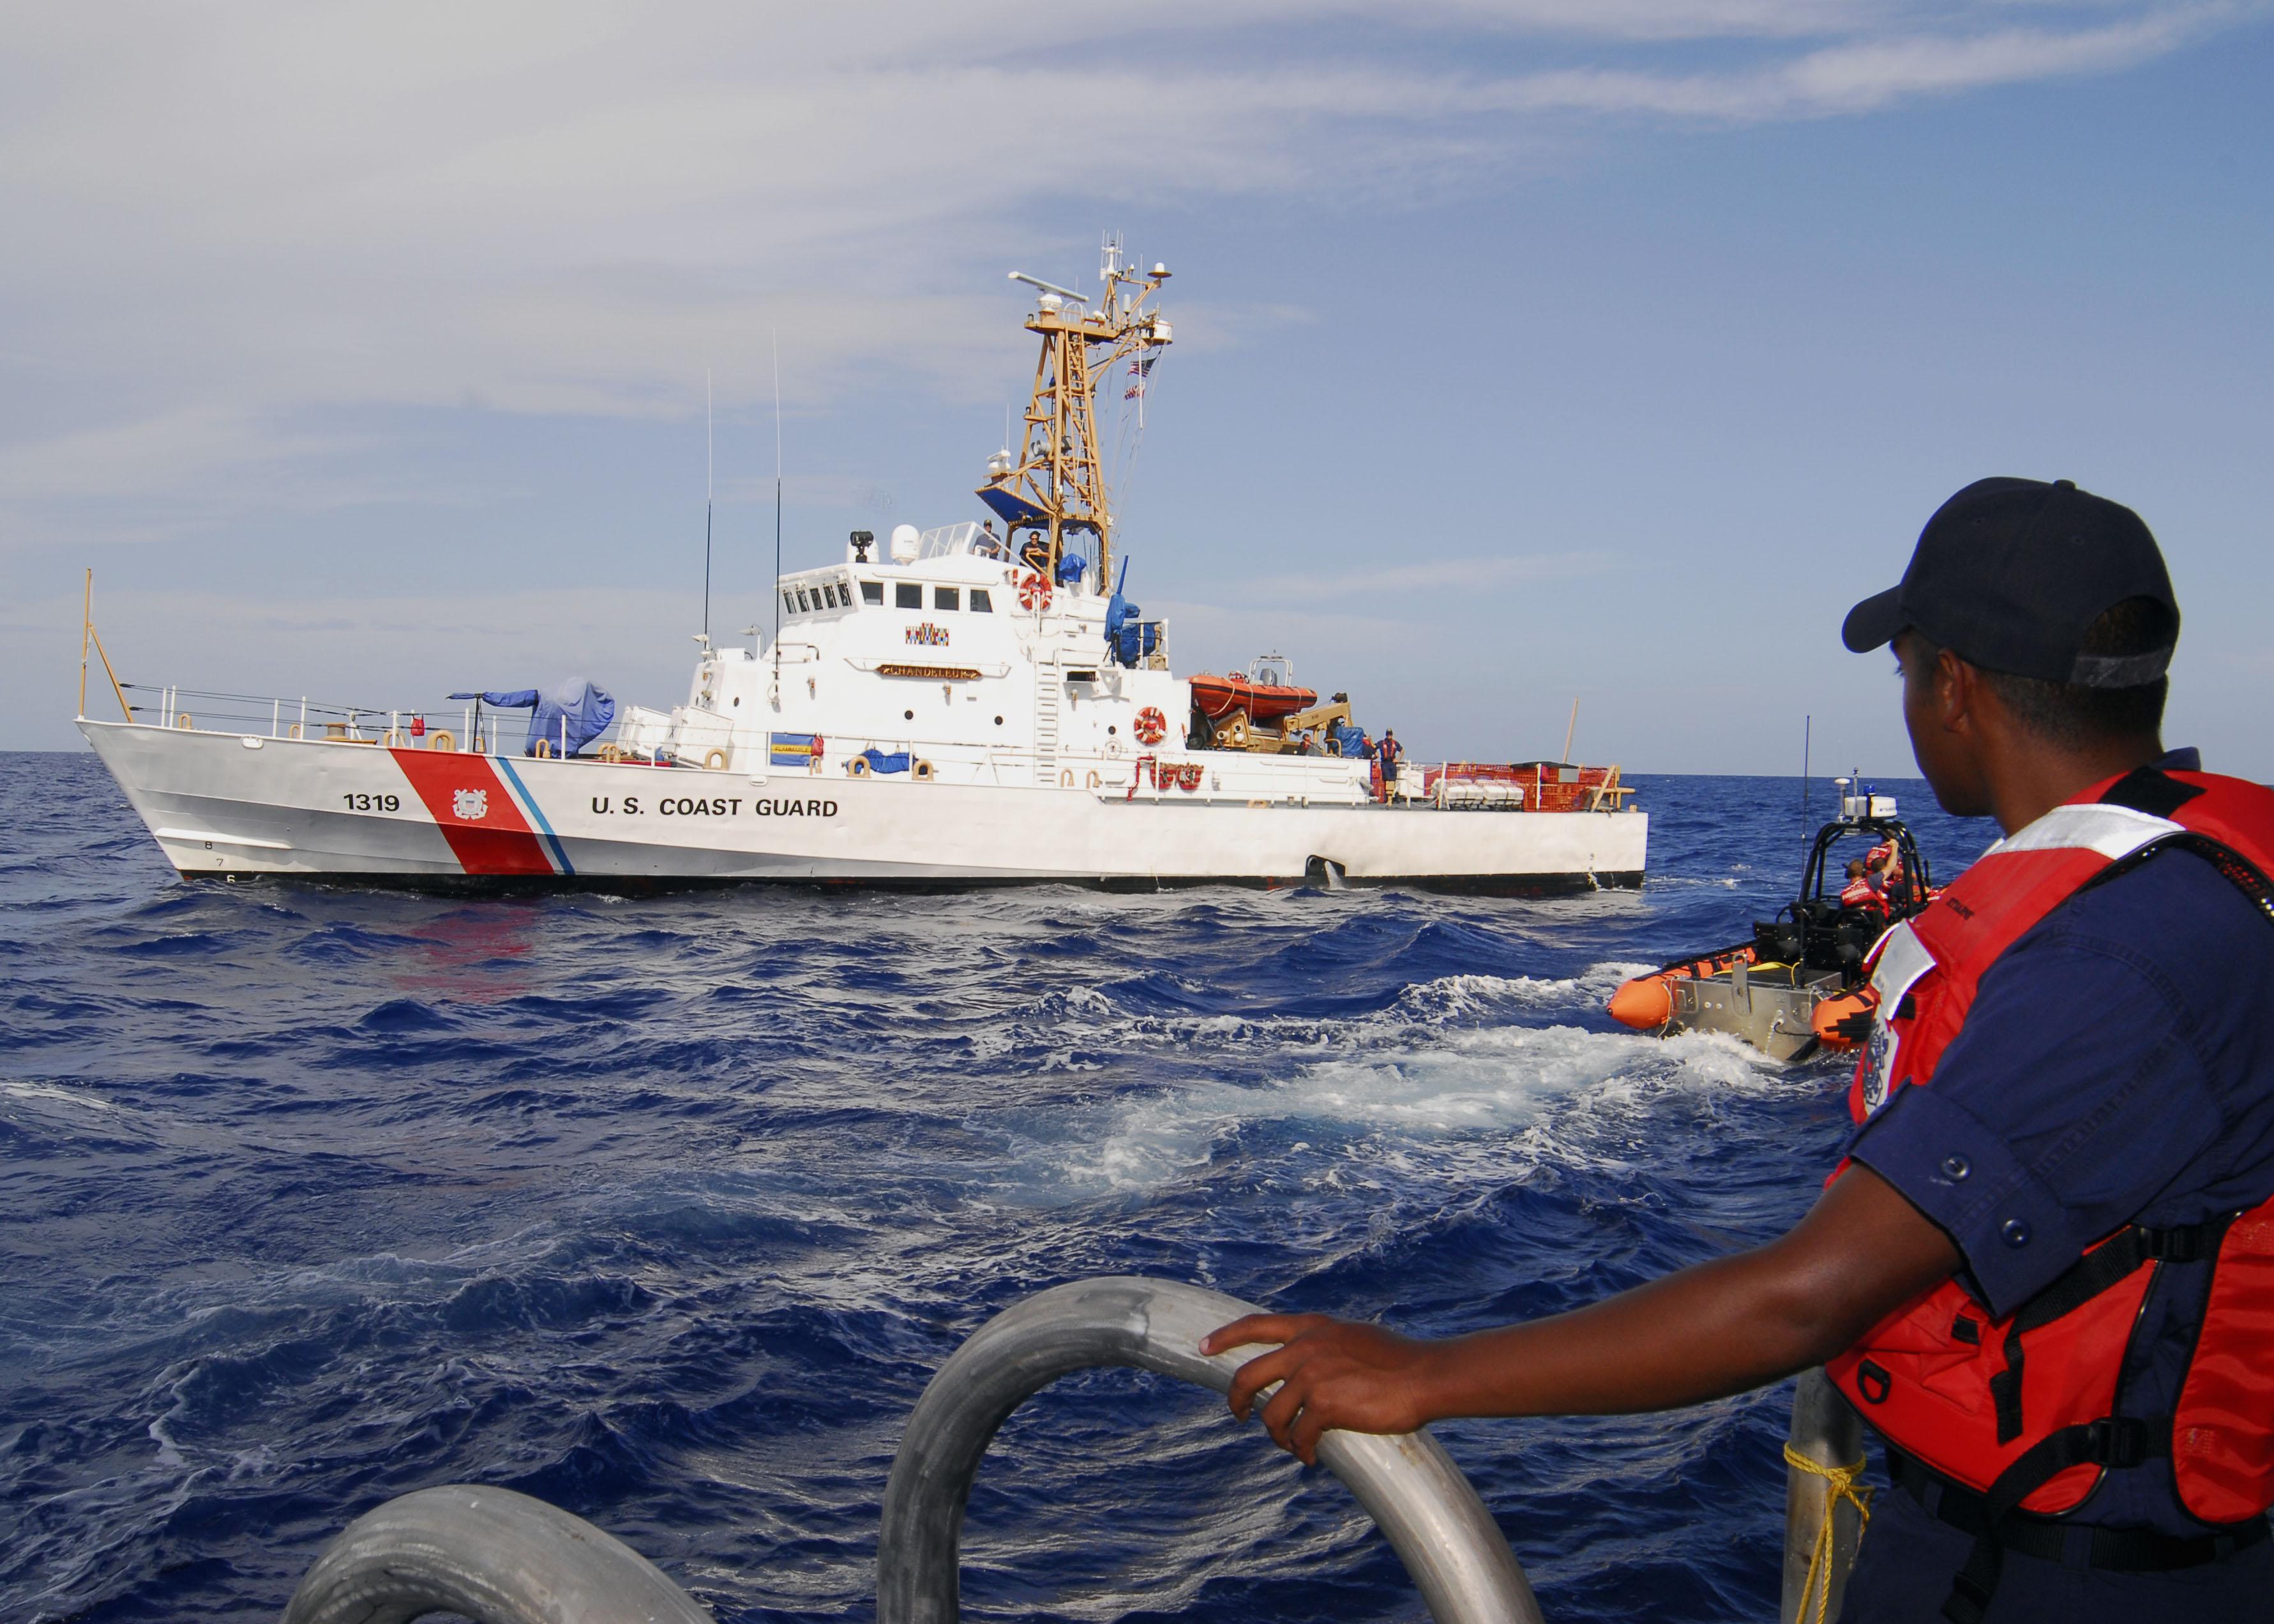 File:United States Coast Guard Cutter Chandeleur.jpg - Wikimedia Commons